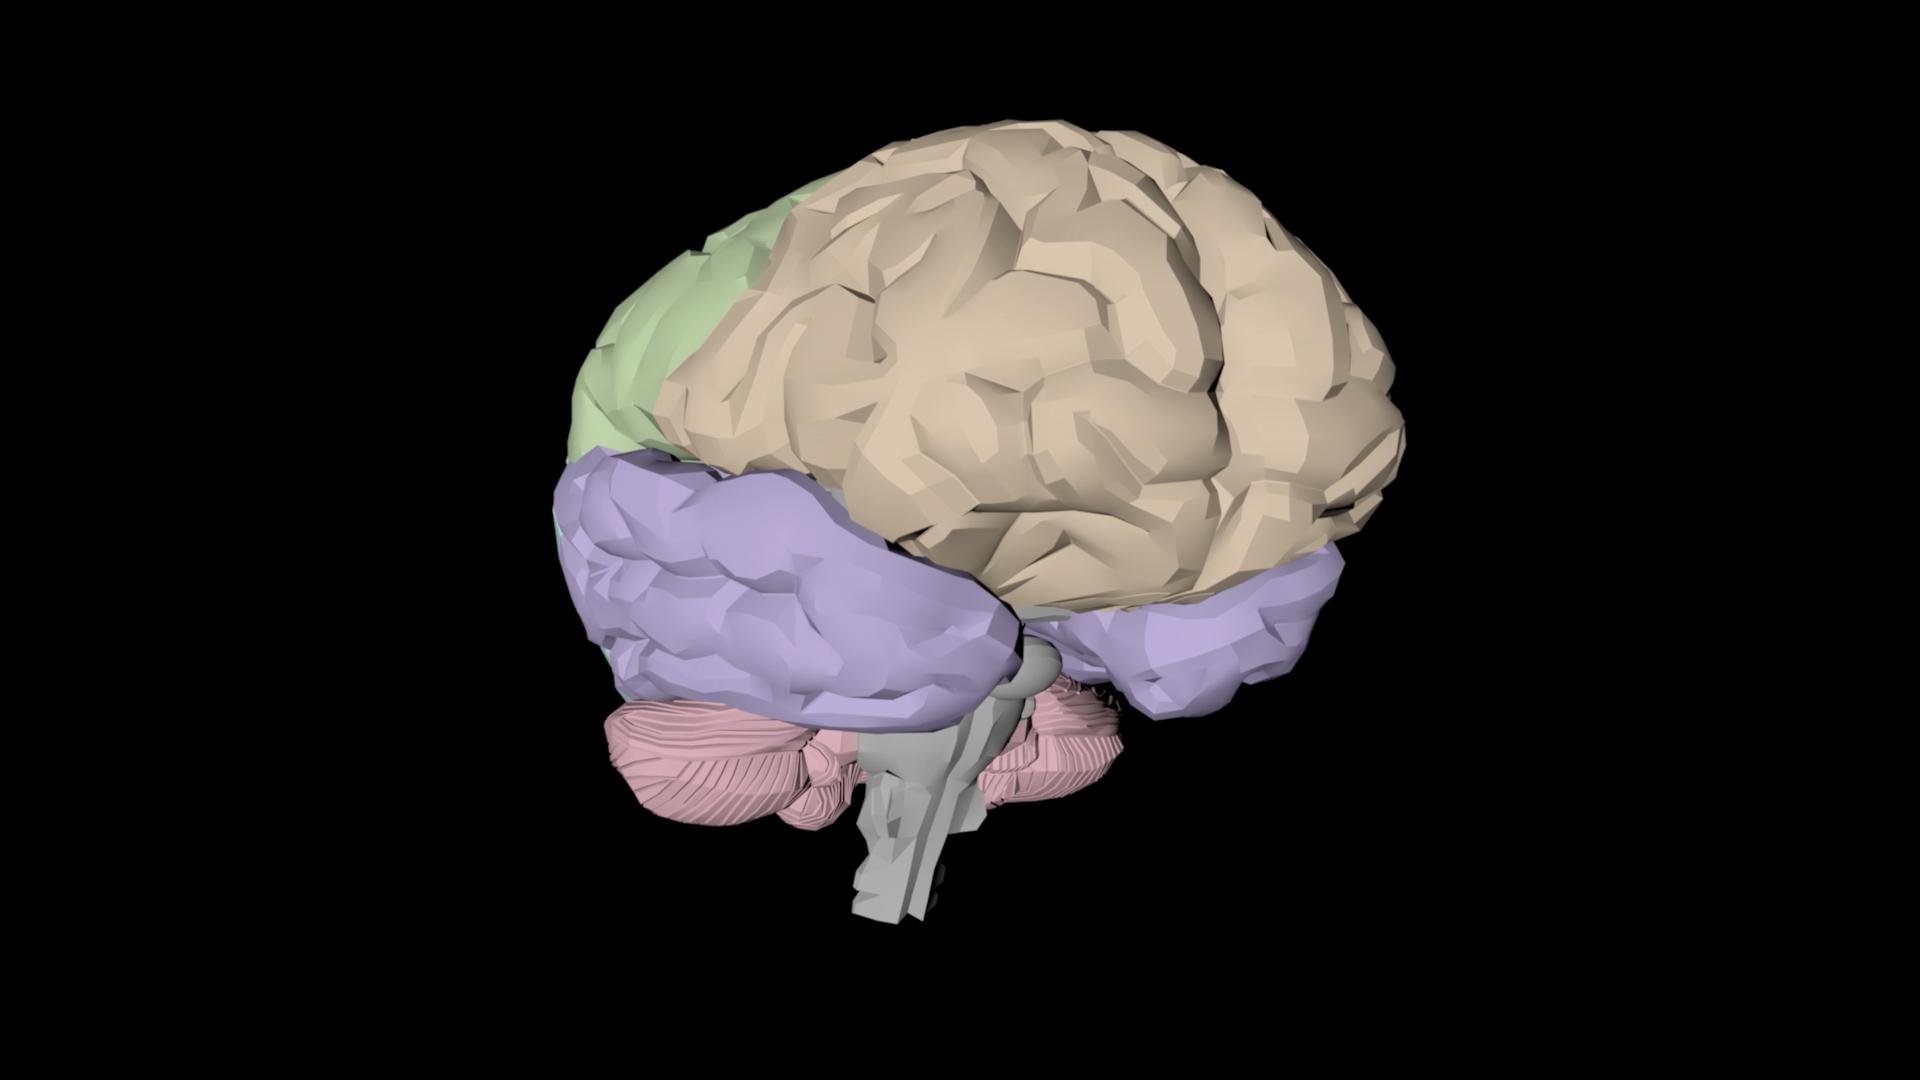 Exploring the Brain_V2_Final_1